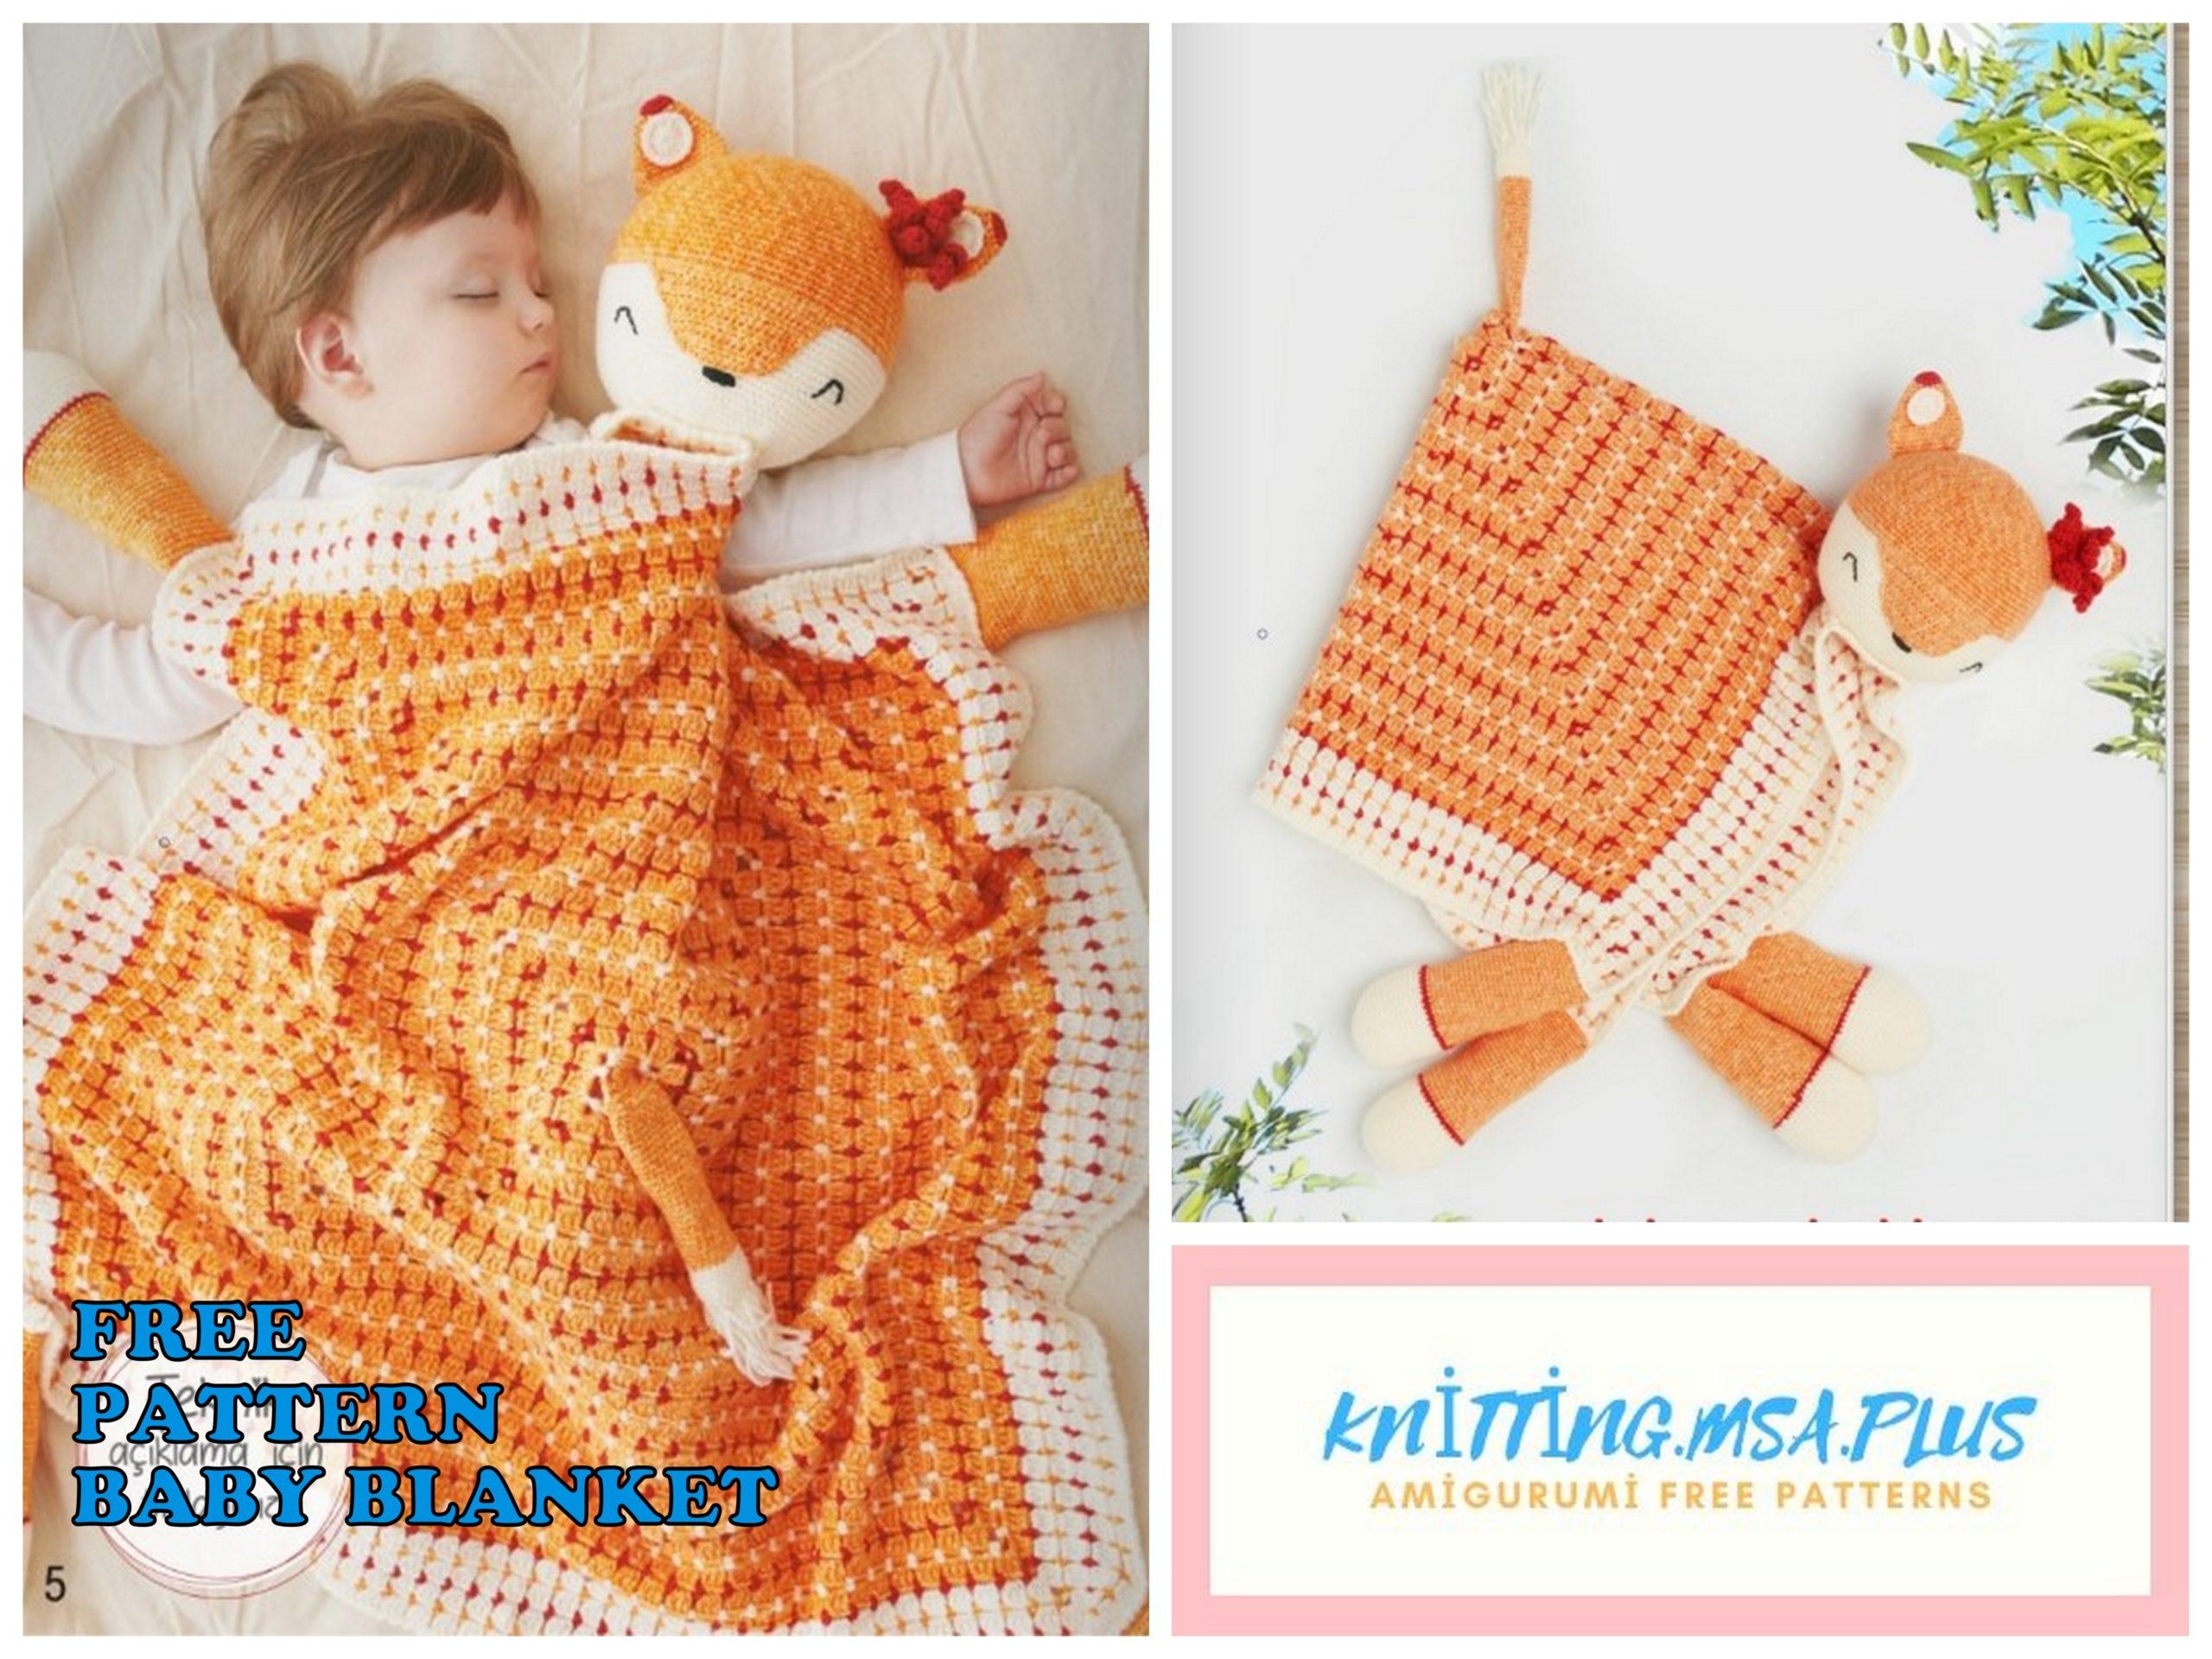 Amigurumi Fox Baby Blanket Free Crochet Pattern